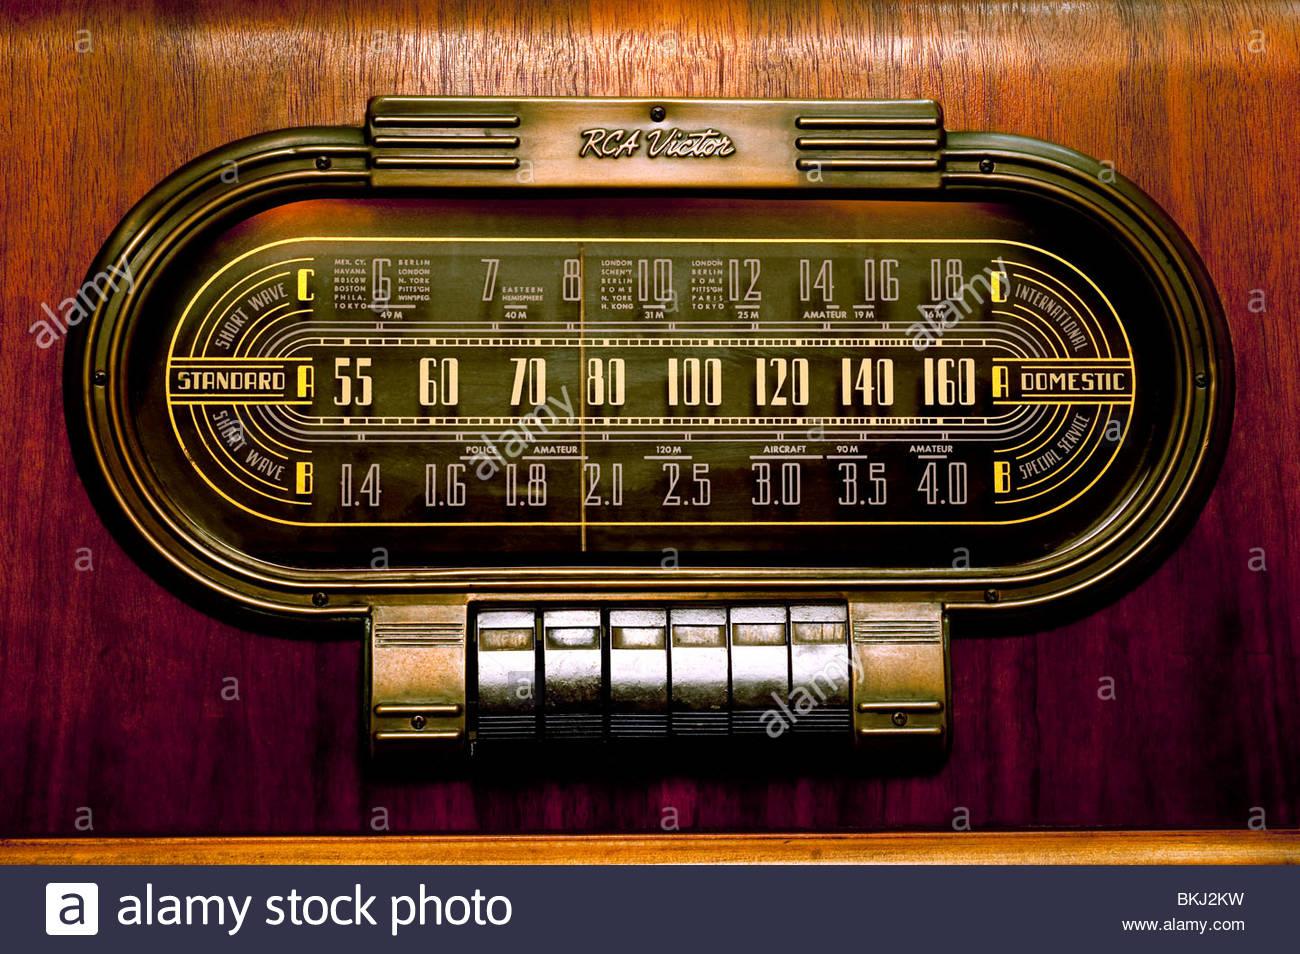 Vintage Antique RCA Modelo 1940 de Radio de onda corta de 19K de bandas de aficionados hermoso casco antiguo cerca Imagen De Stock